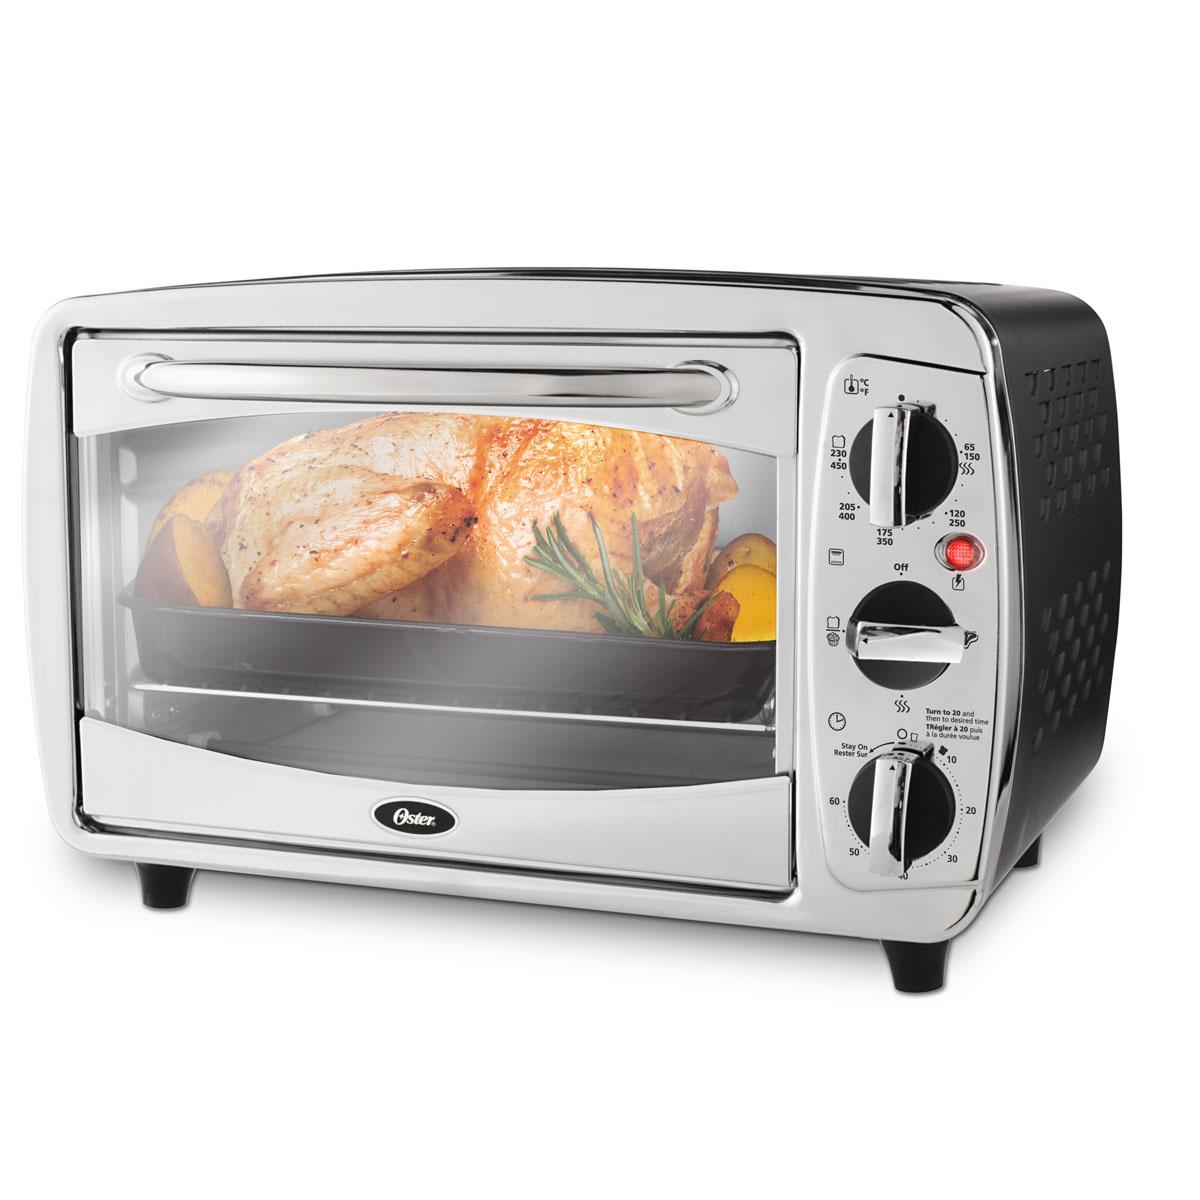 Oster 174 6 Slice Countertop Oven Stainless Steel Tssttv0000